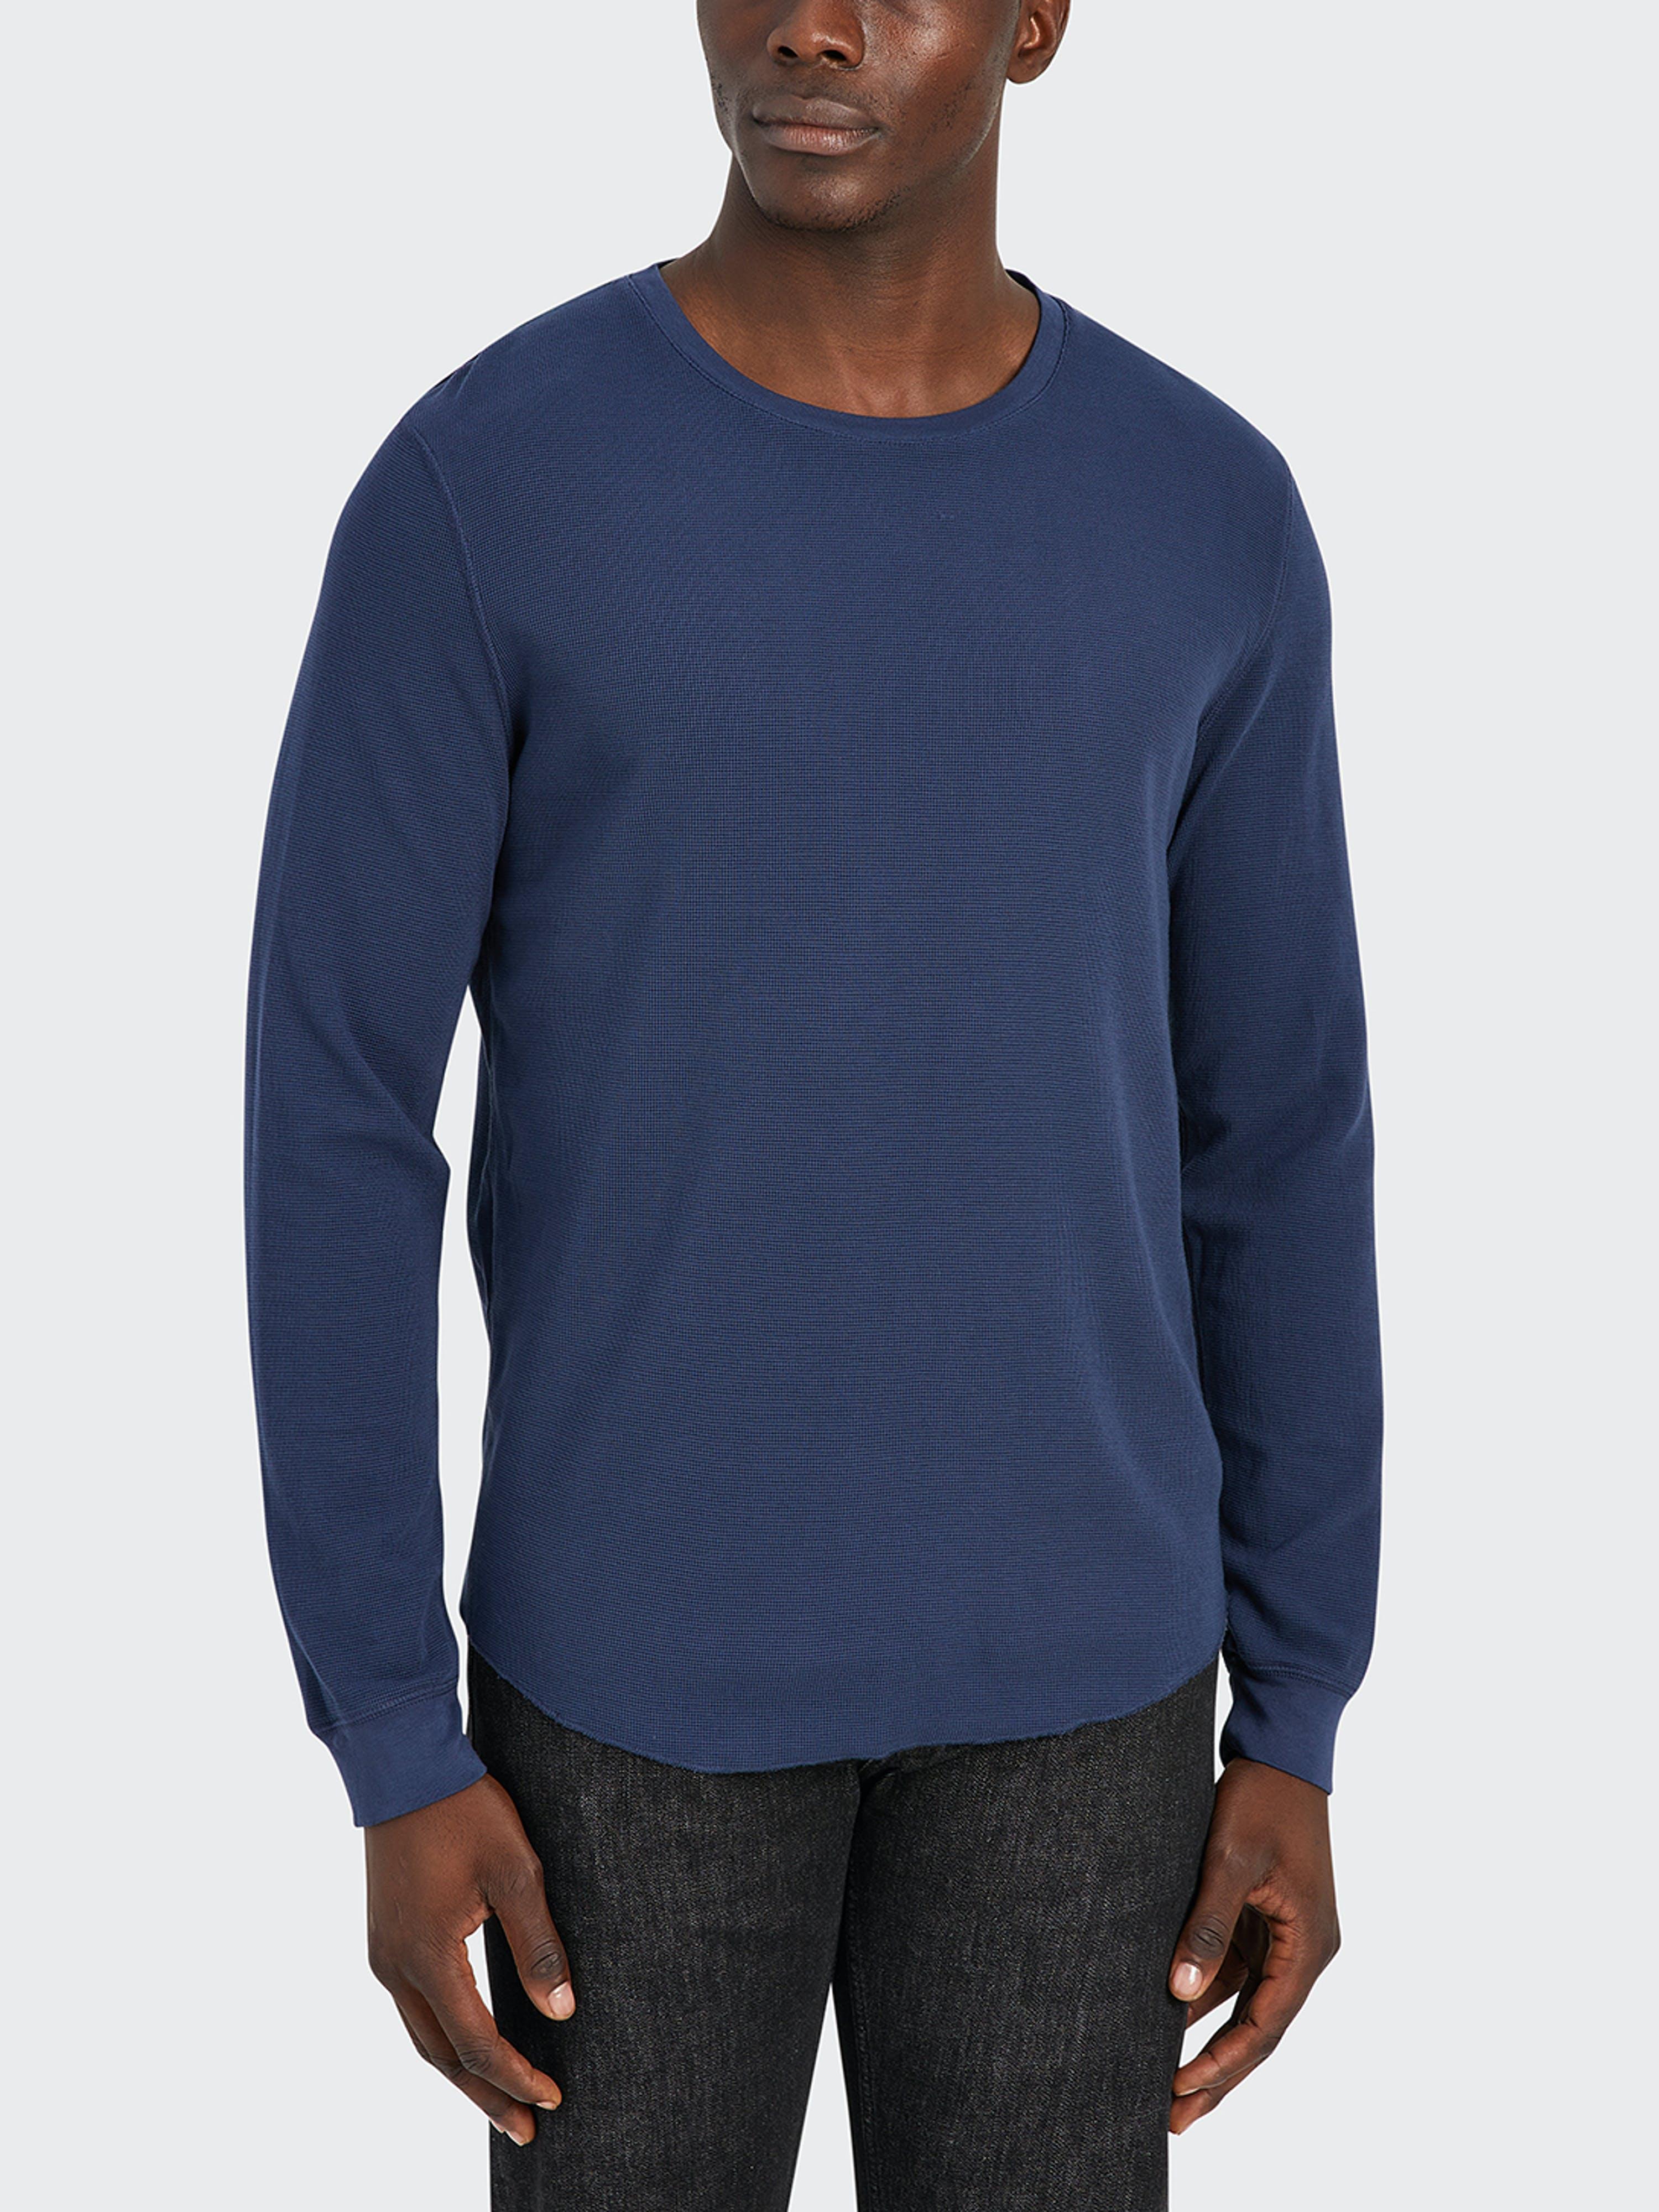 ONS Clothing Waffle Long Sleeve Village Crew Tee  - Blue